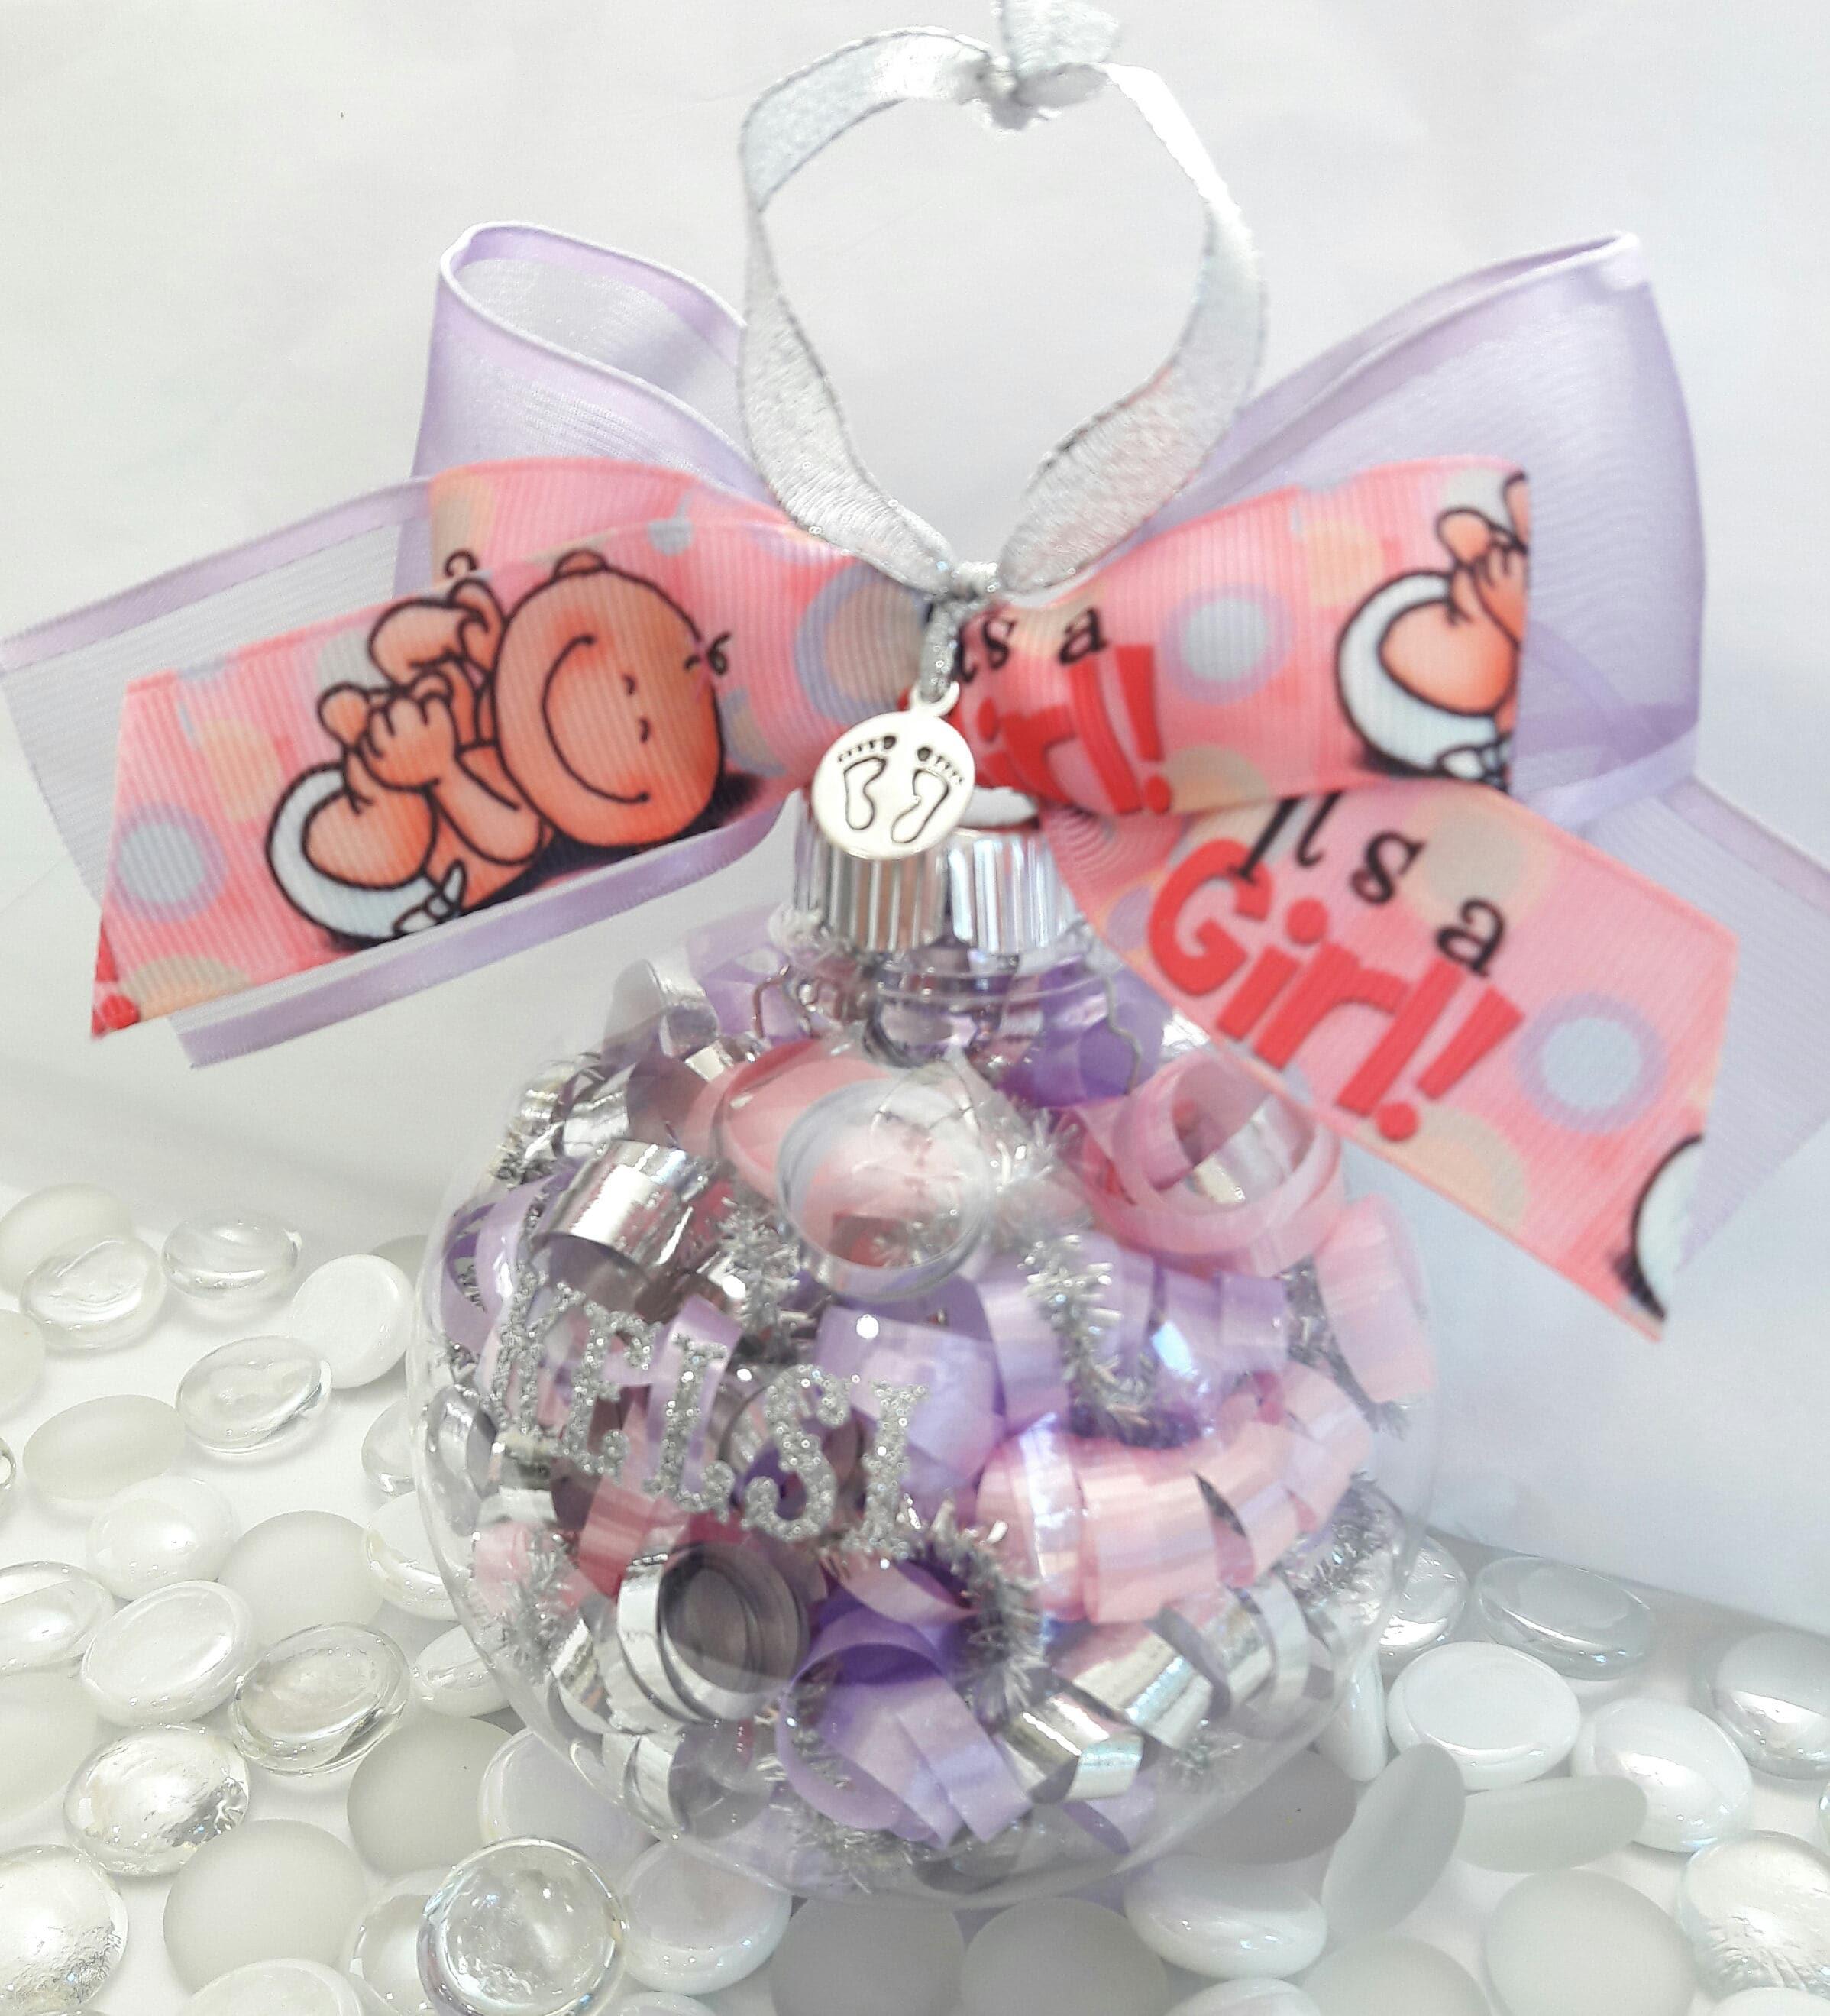 Baby Girl Christening Favors Glass Ornament: Personalized It's A Girl Glass Ornament Baby Reveal Baby